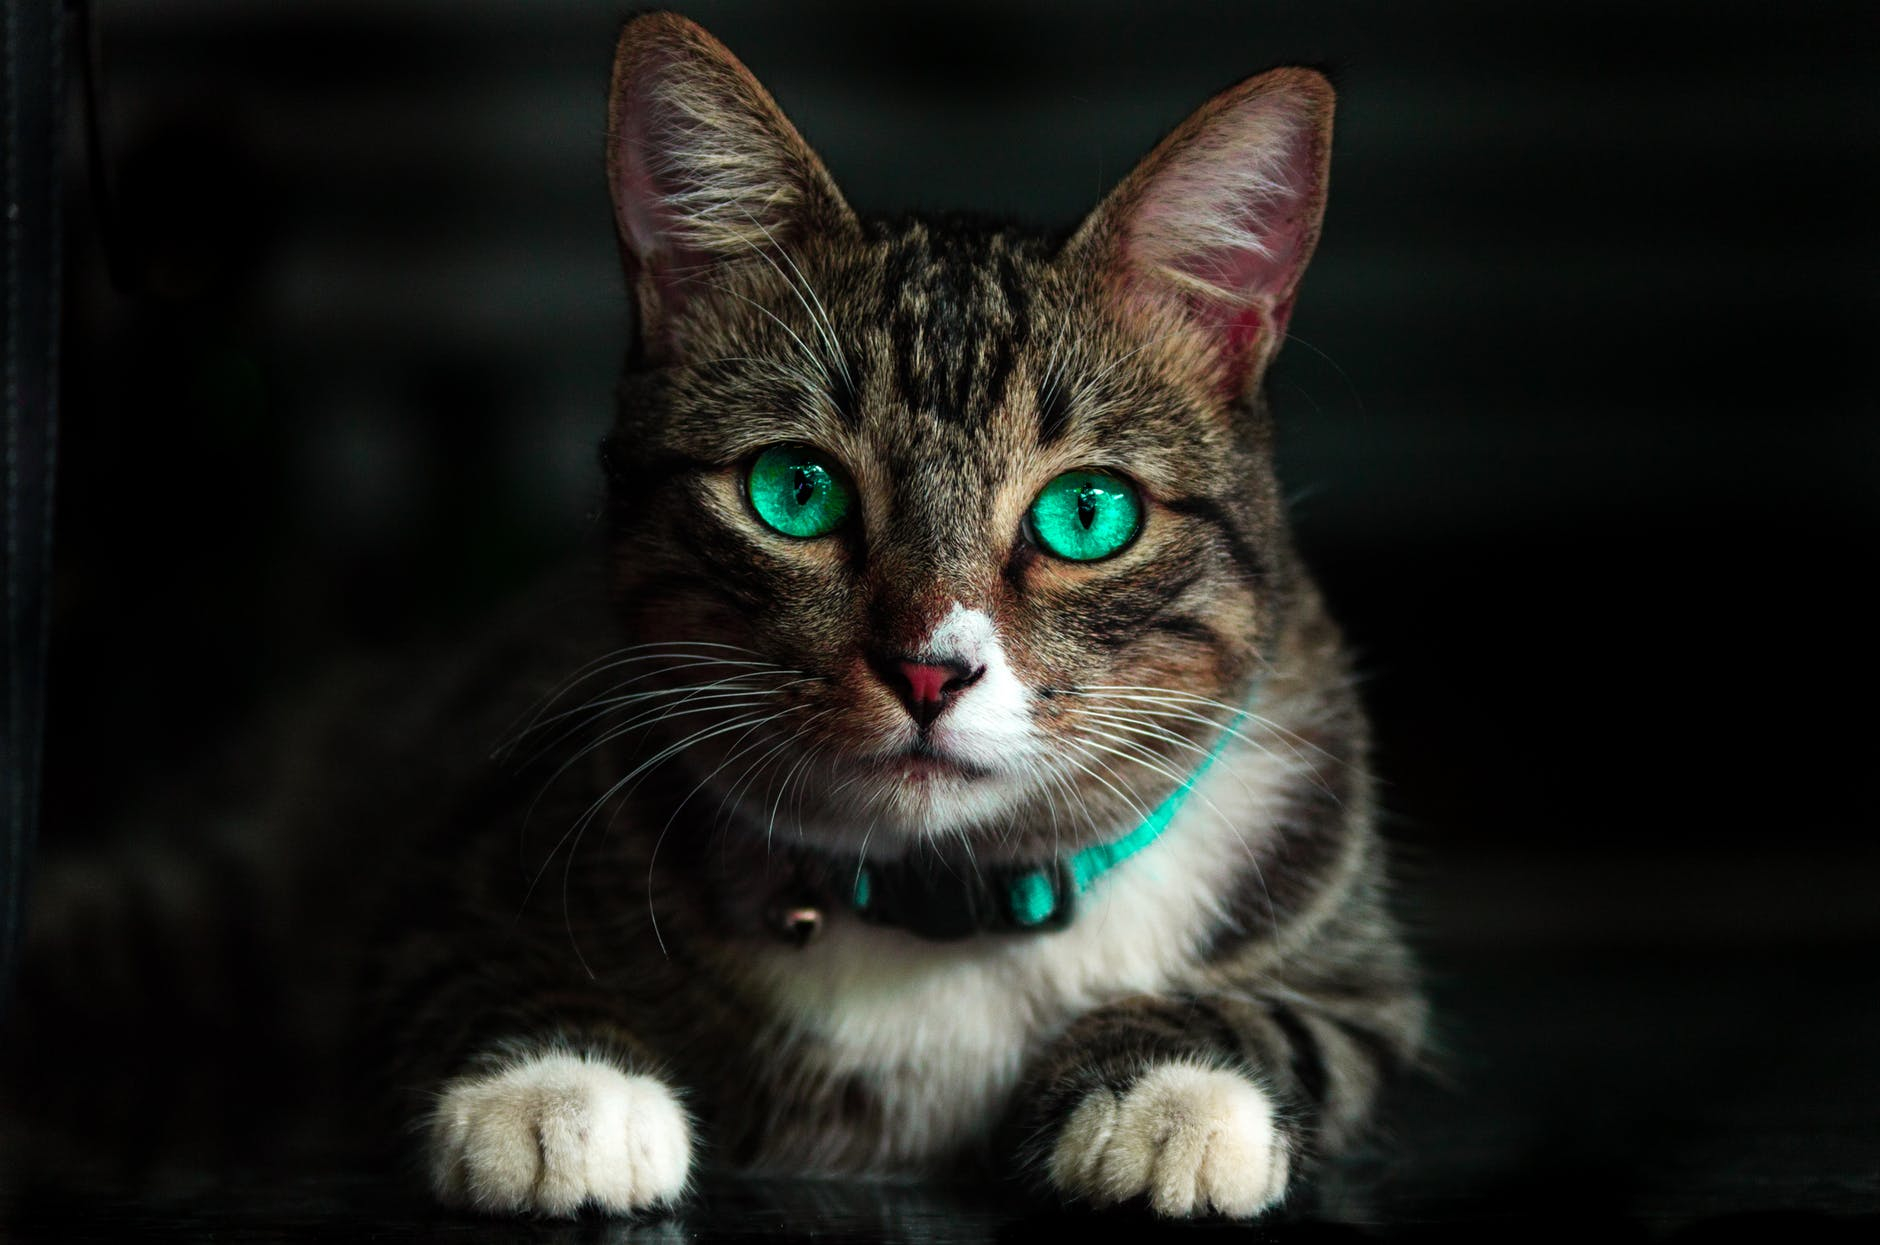 "Photo by Kelvin Valerio on <a href=""https://www.pexels.com/photo/adorable-animal-blur-cat-617278/"" rel=""nofollow"">Pexels.com</a>"